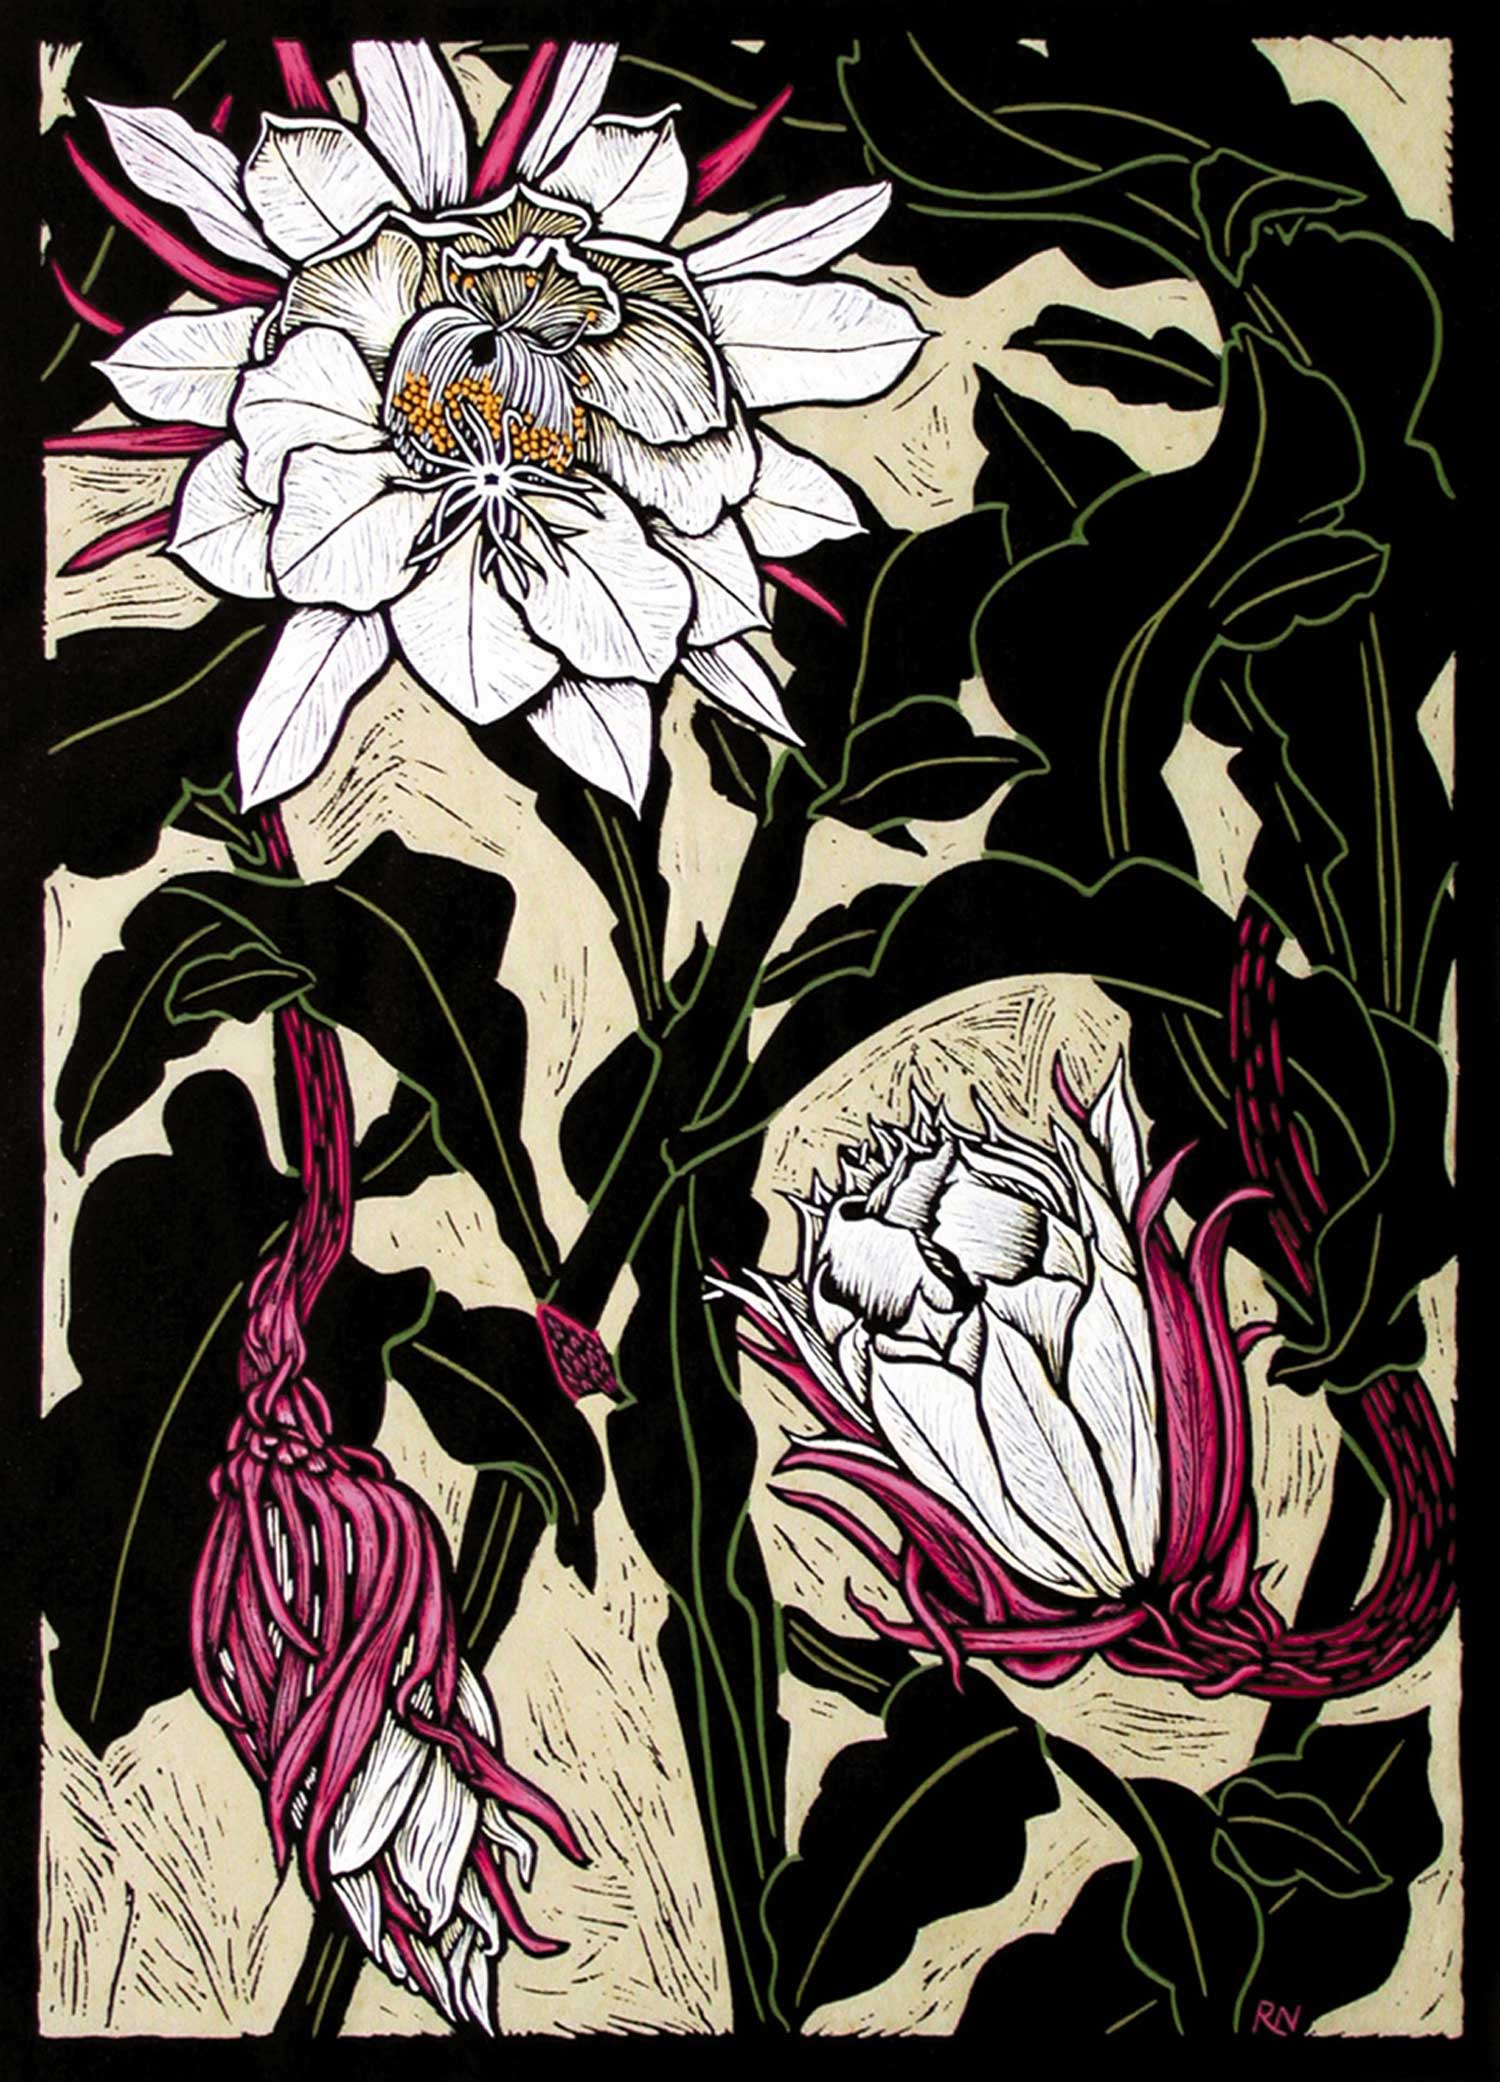 NIGHT FLOWERING CACTUS  48.5 X 35 CM EDITION OF 50  HAND COLOURED LINOCUT ON HANDMADE JAPANESE PAPER  $1,100